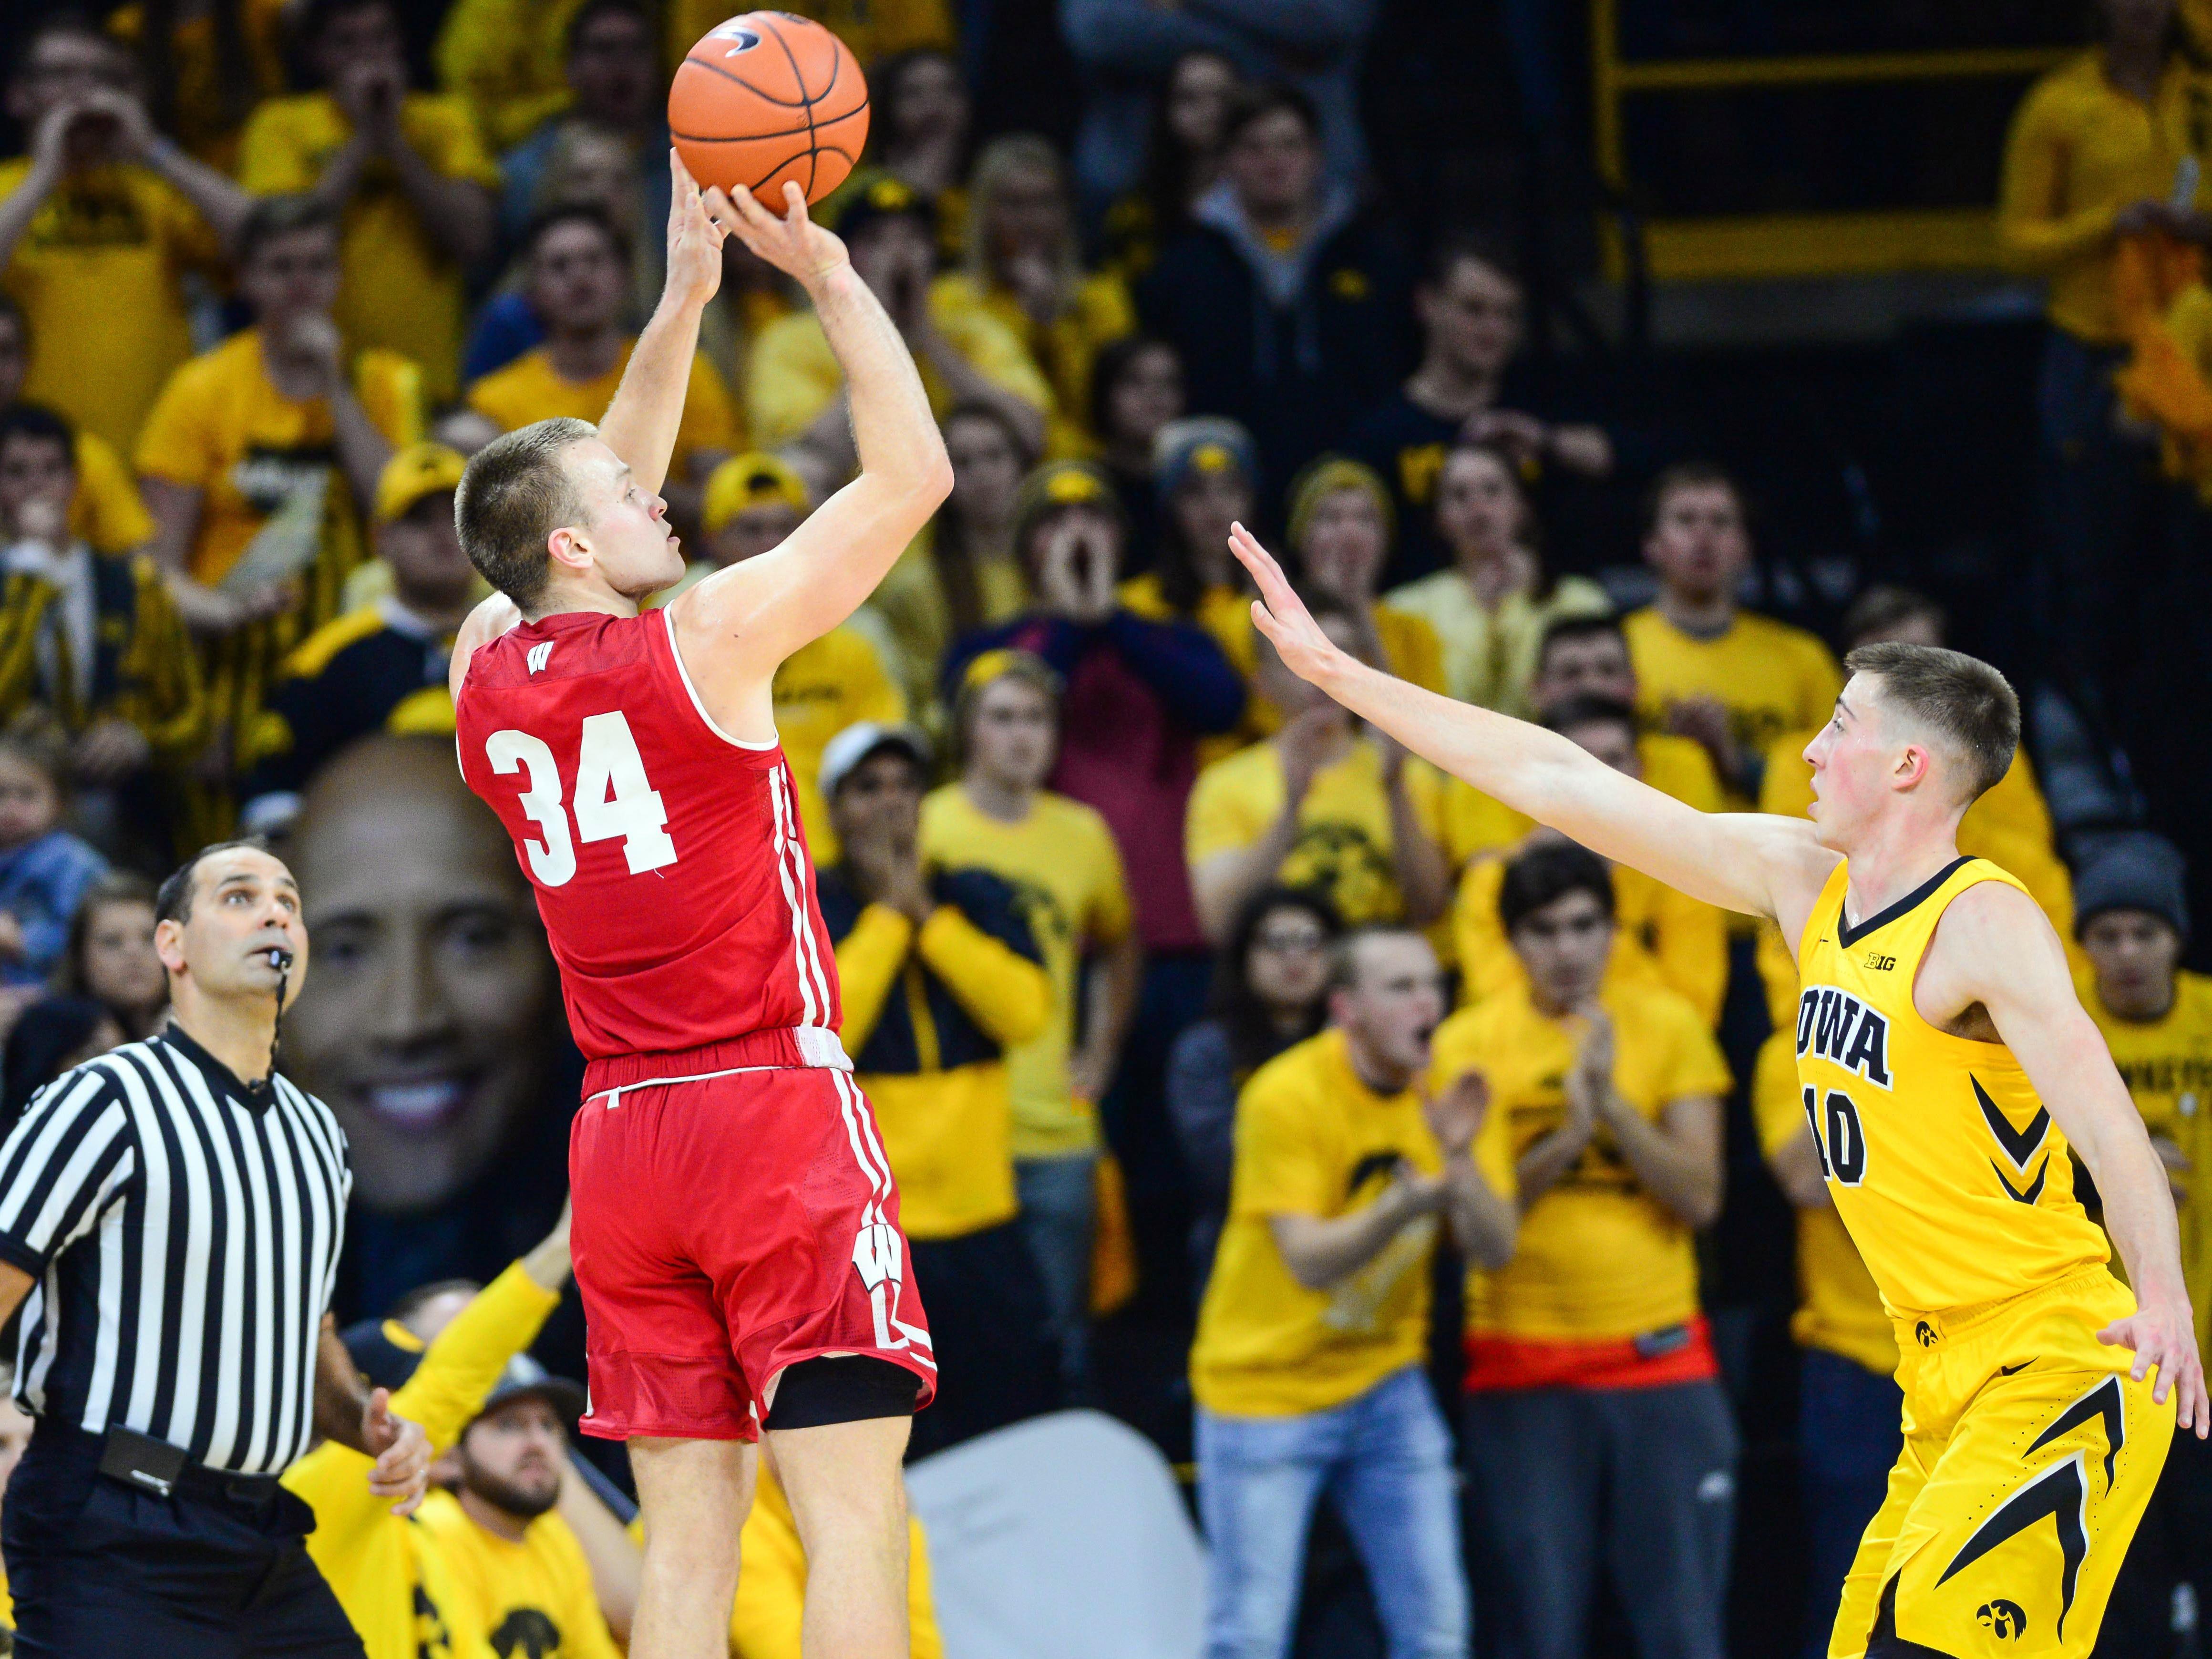 Badgers guard Brad Davison hoists up a three-pointer over Iowa guard Joe Wieskamp on Friday night.